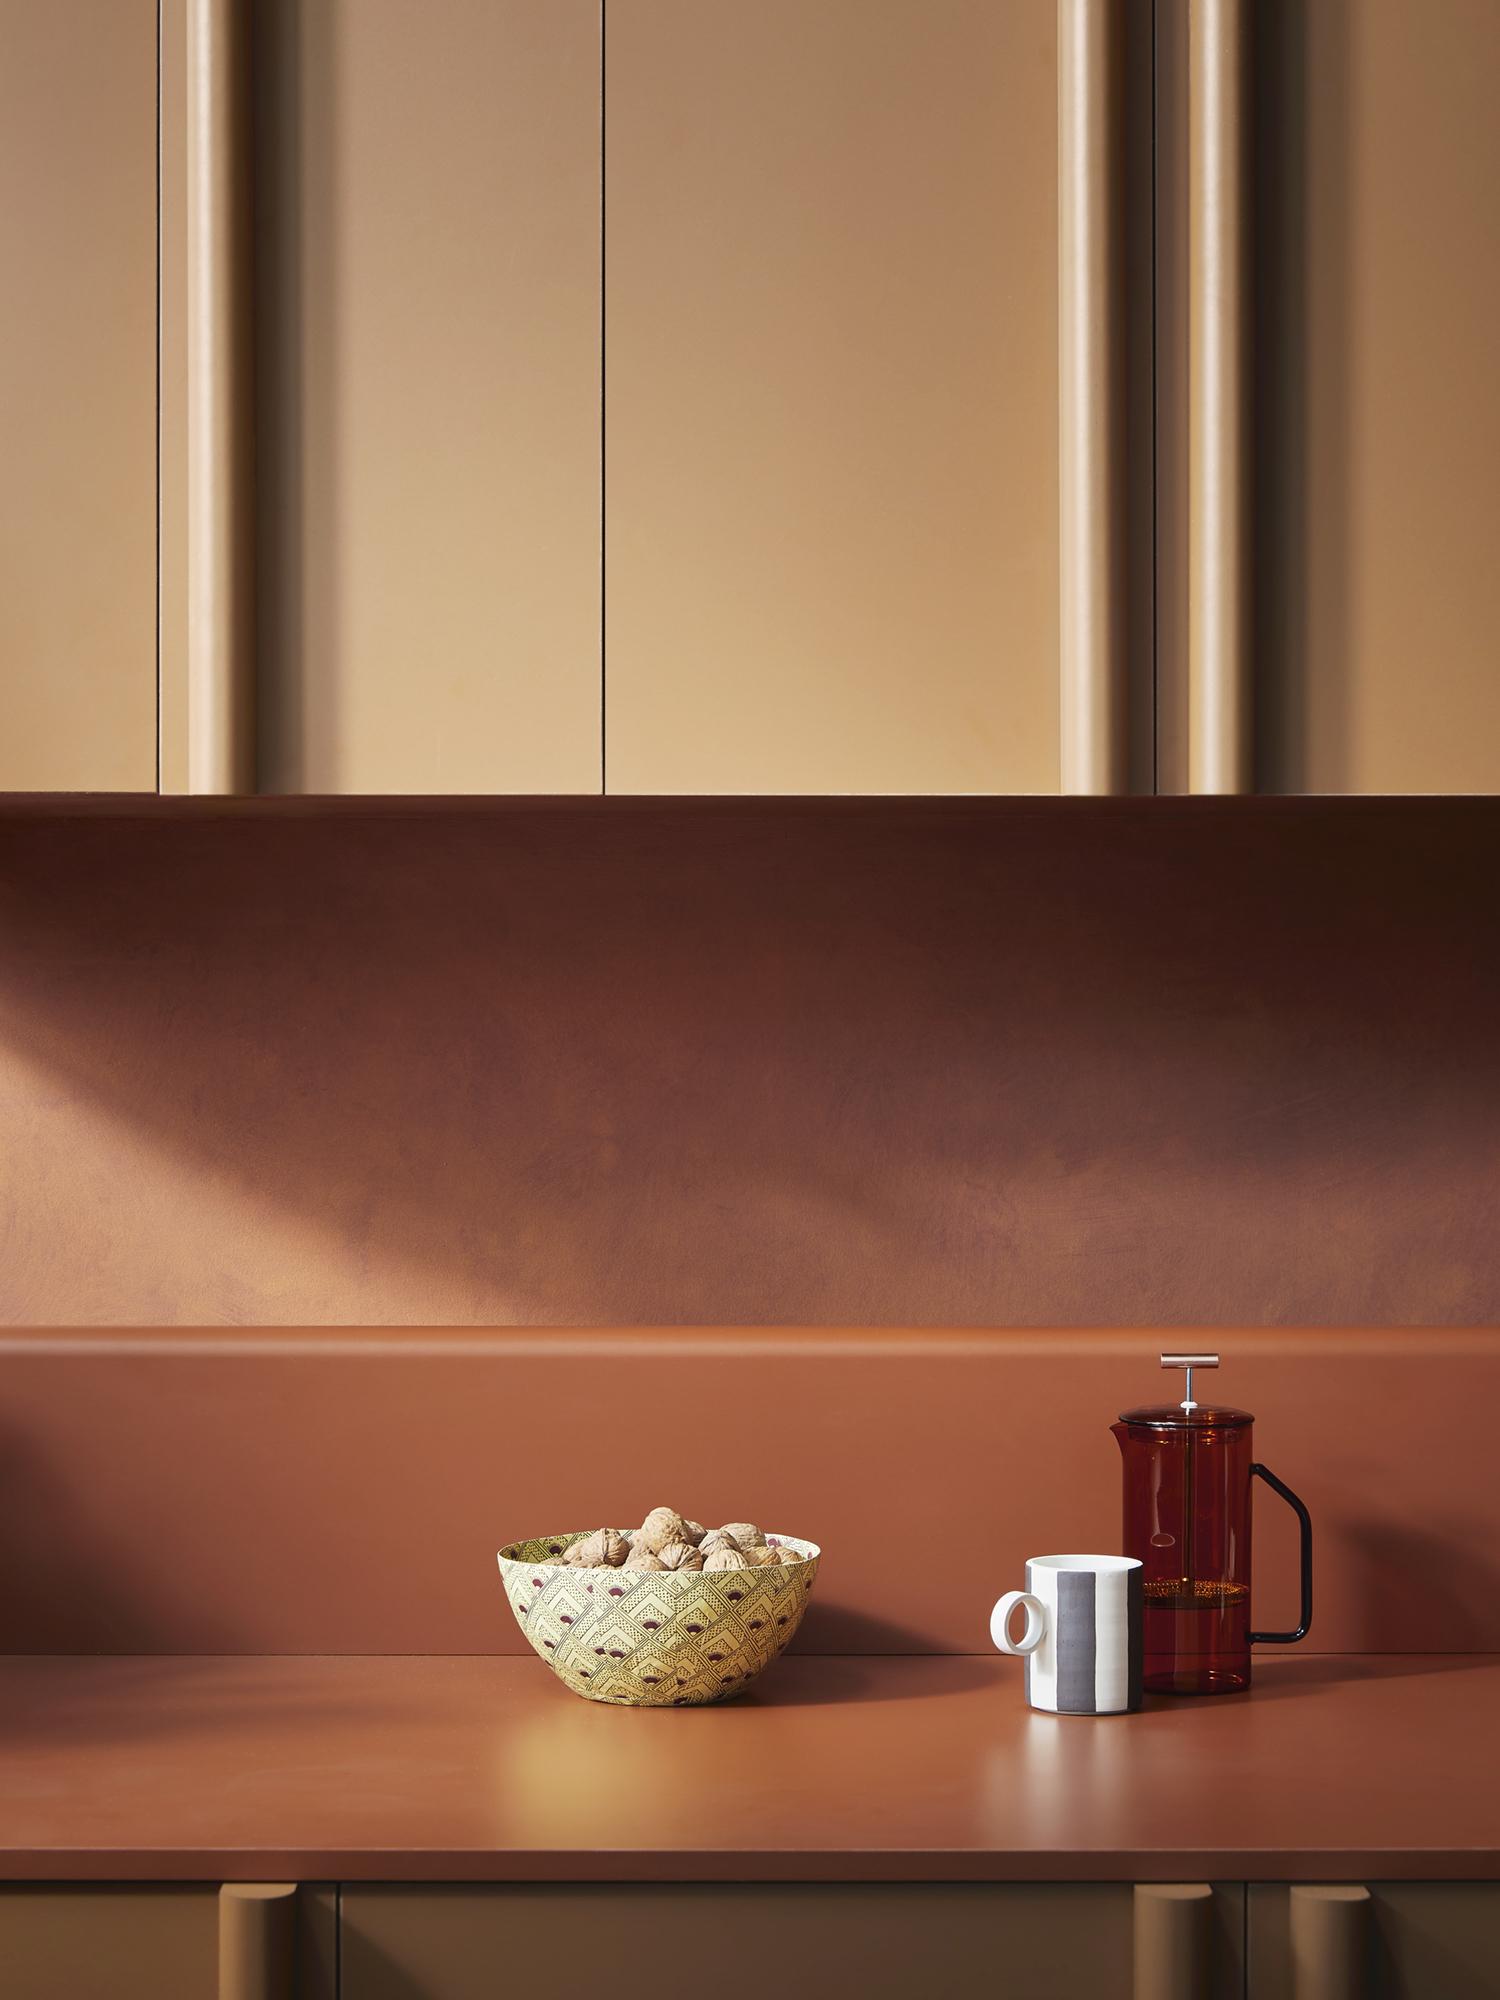 est living laminex ysg studio fantales kitchen 1